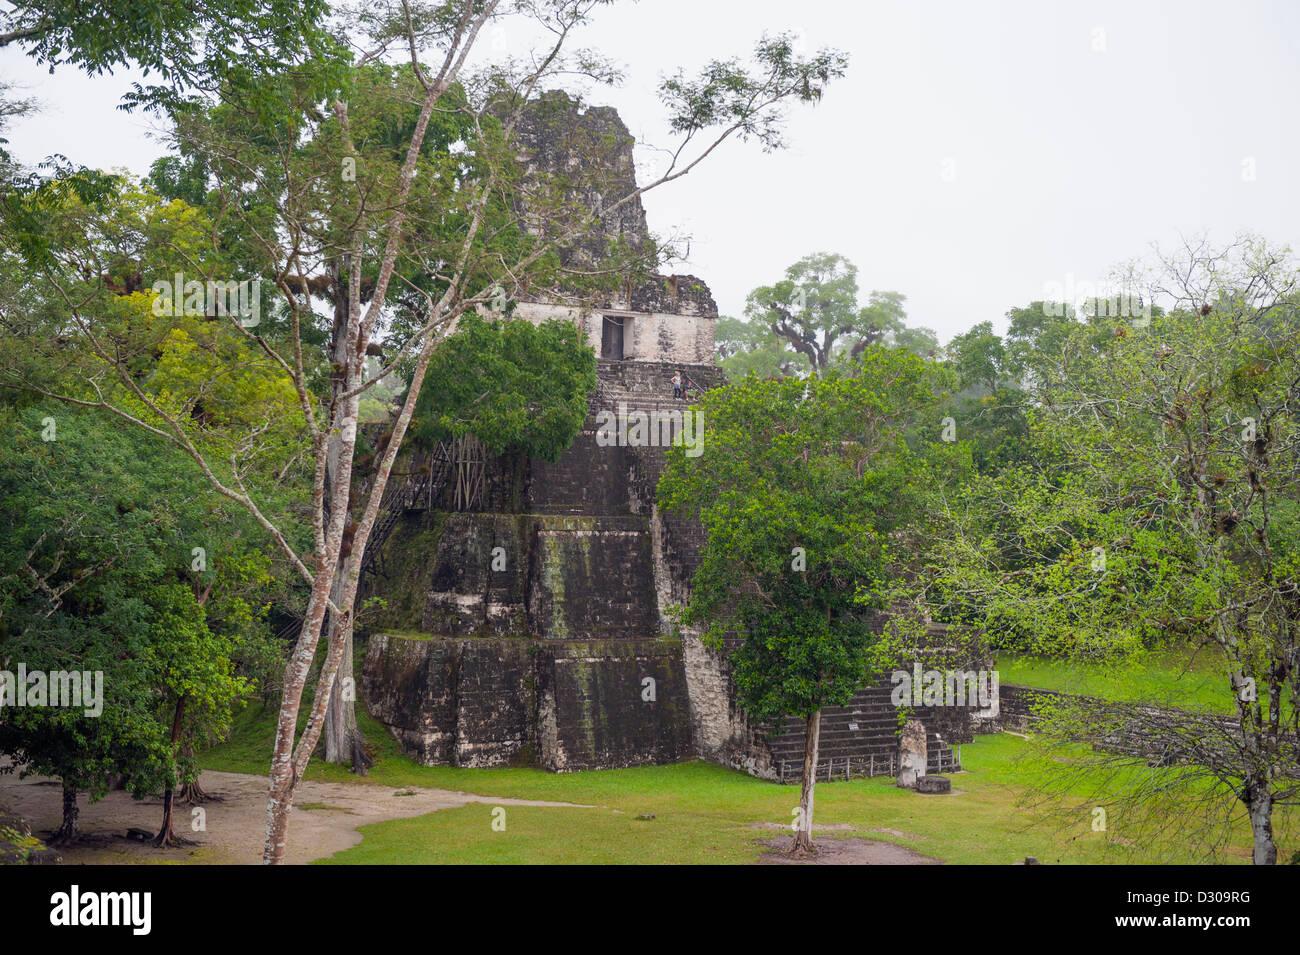 Tikal Maya ruins, Unesco World Heritage site, Guatemala, Central America Stock Photo